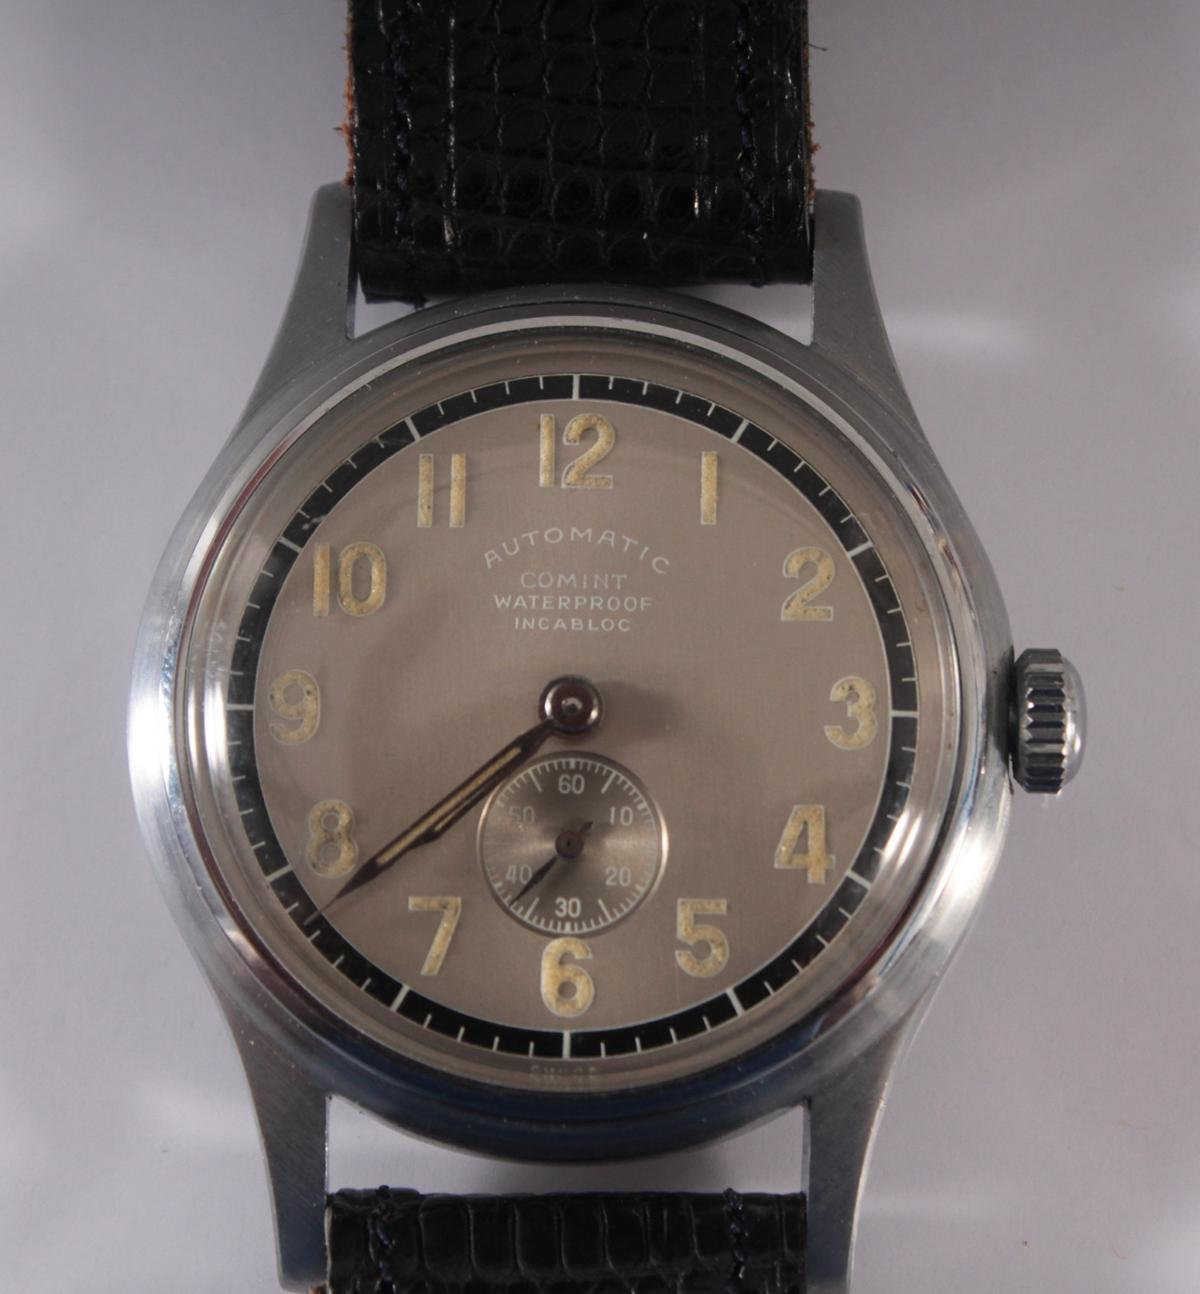 Herrenarmbanduhr der Marke Comint Automatic-2